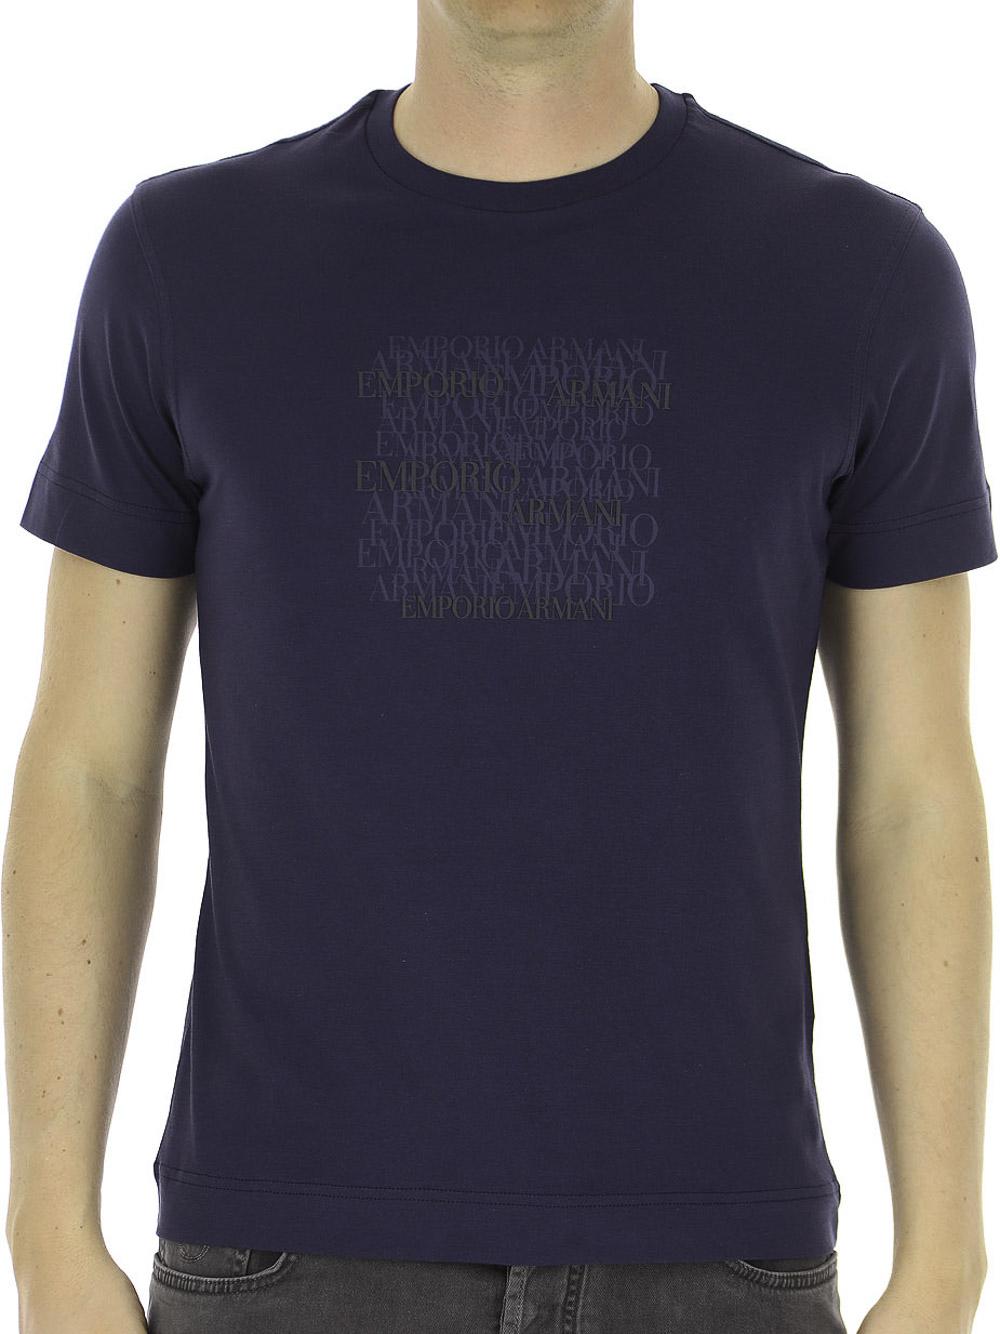 EMPORIO ARMANI Μπλούζα t-shirt 3K1TD61JSHZ-0964 ΡΑΦ